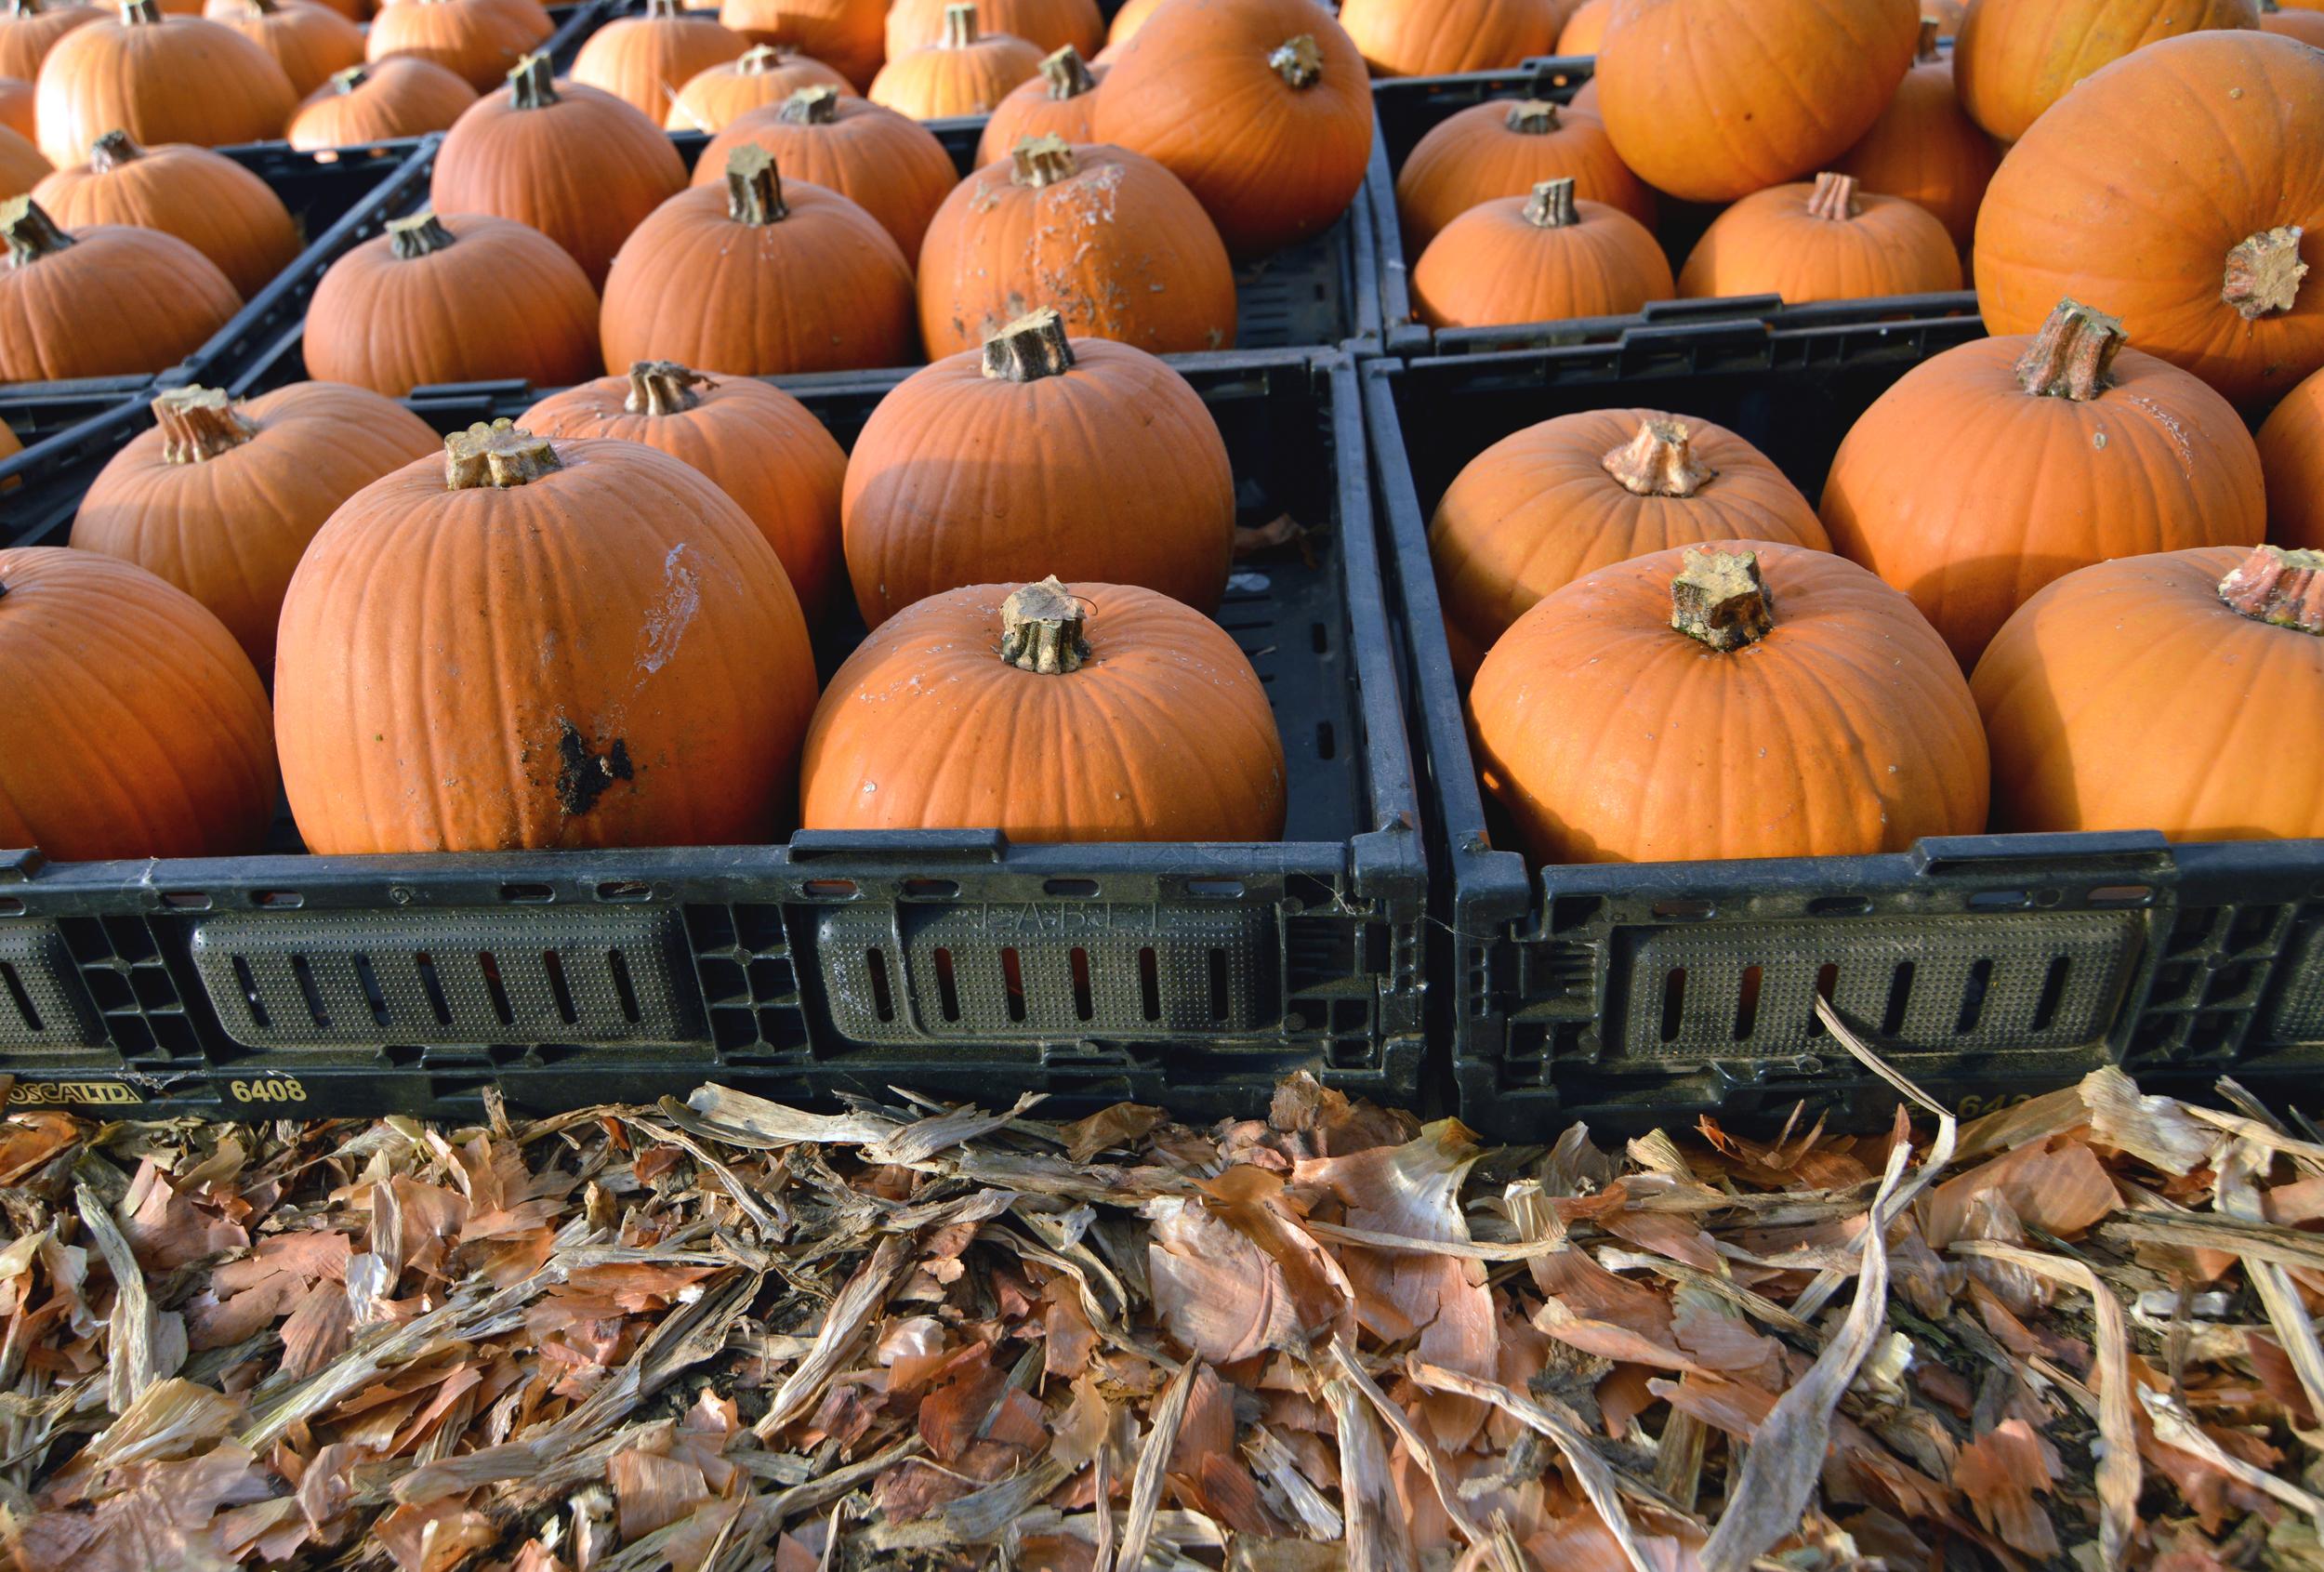 Pumpkin pie anyone?!